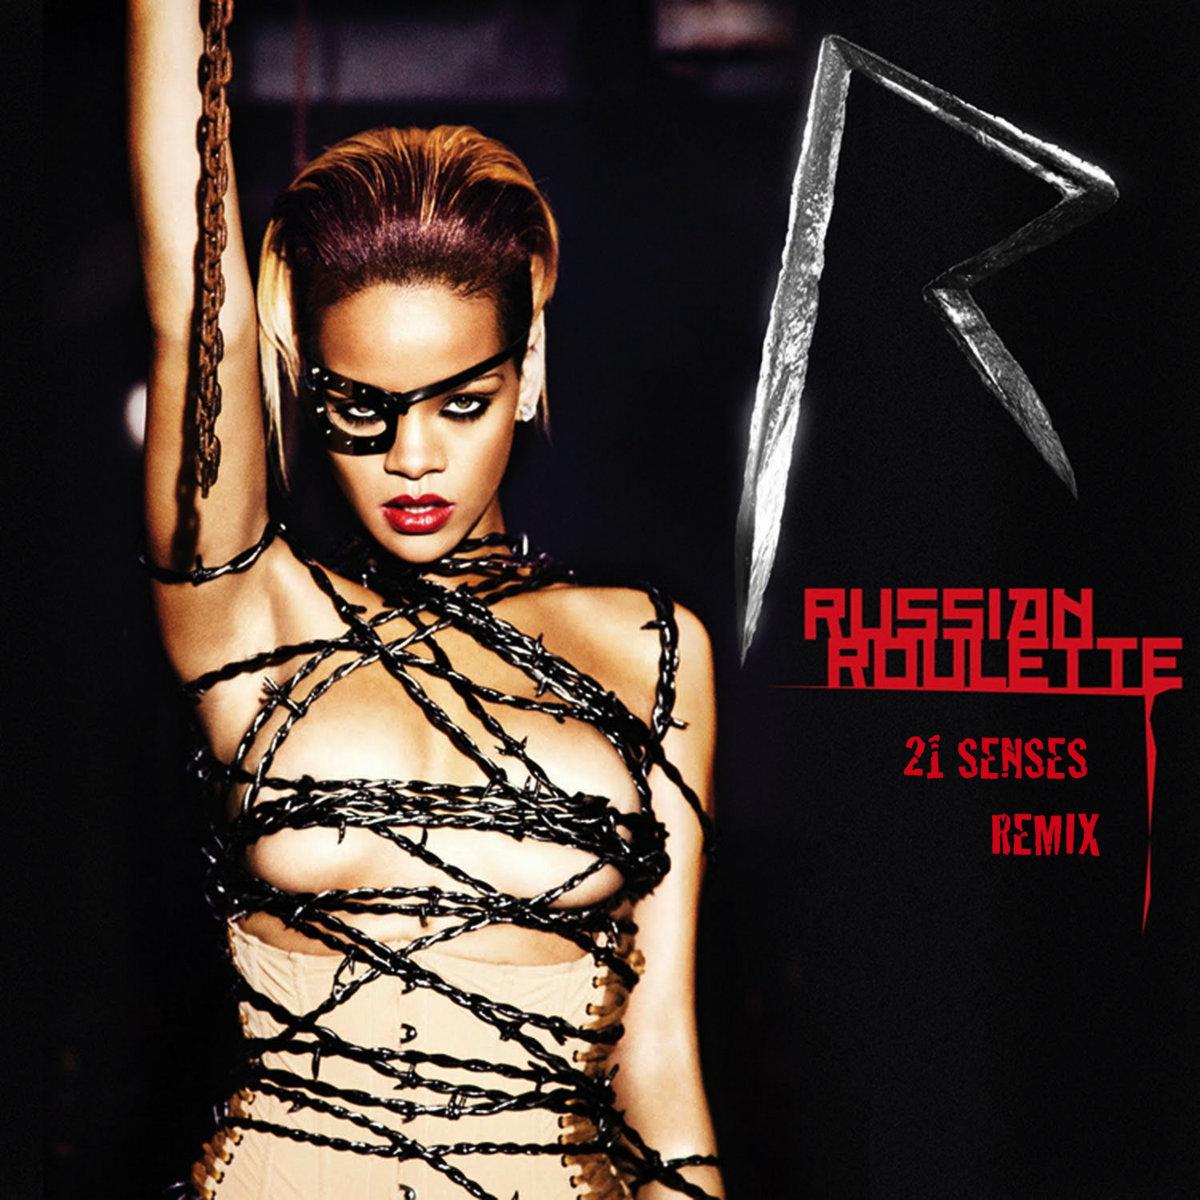 Rihanna russian roulette mp3 скачать бесплатно